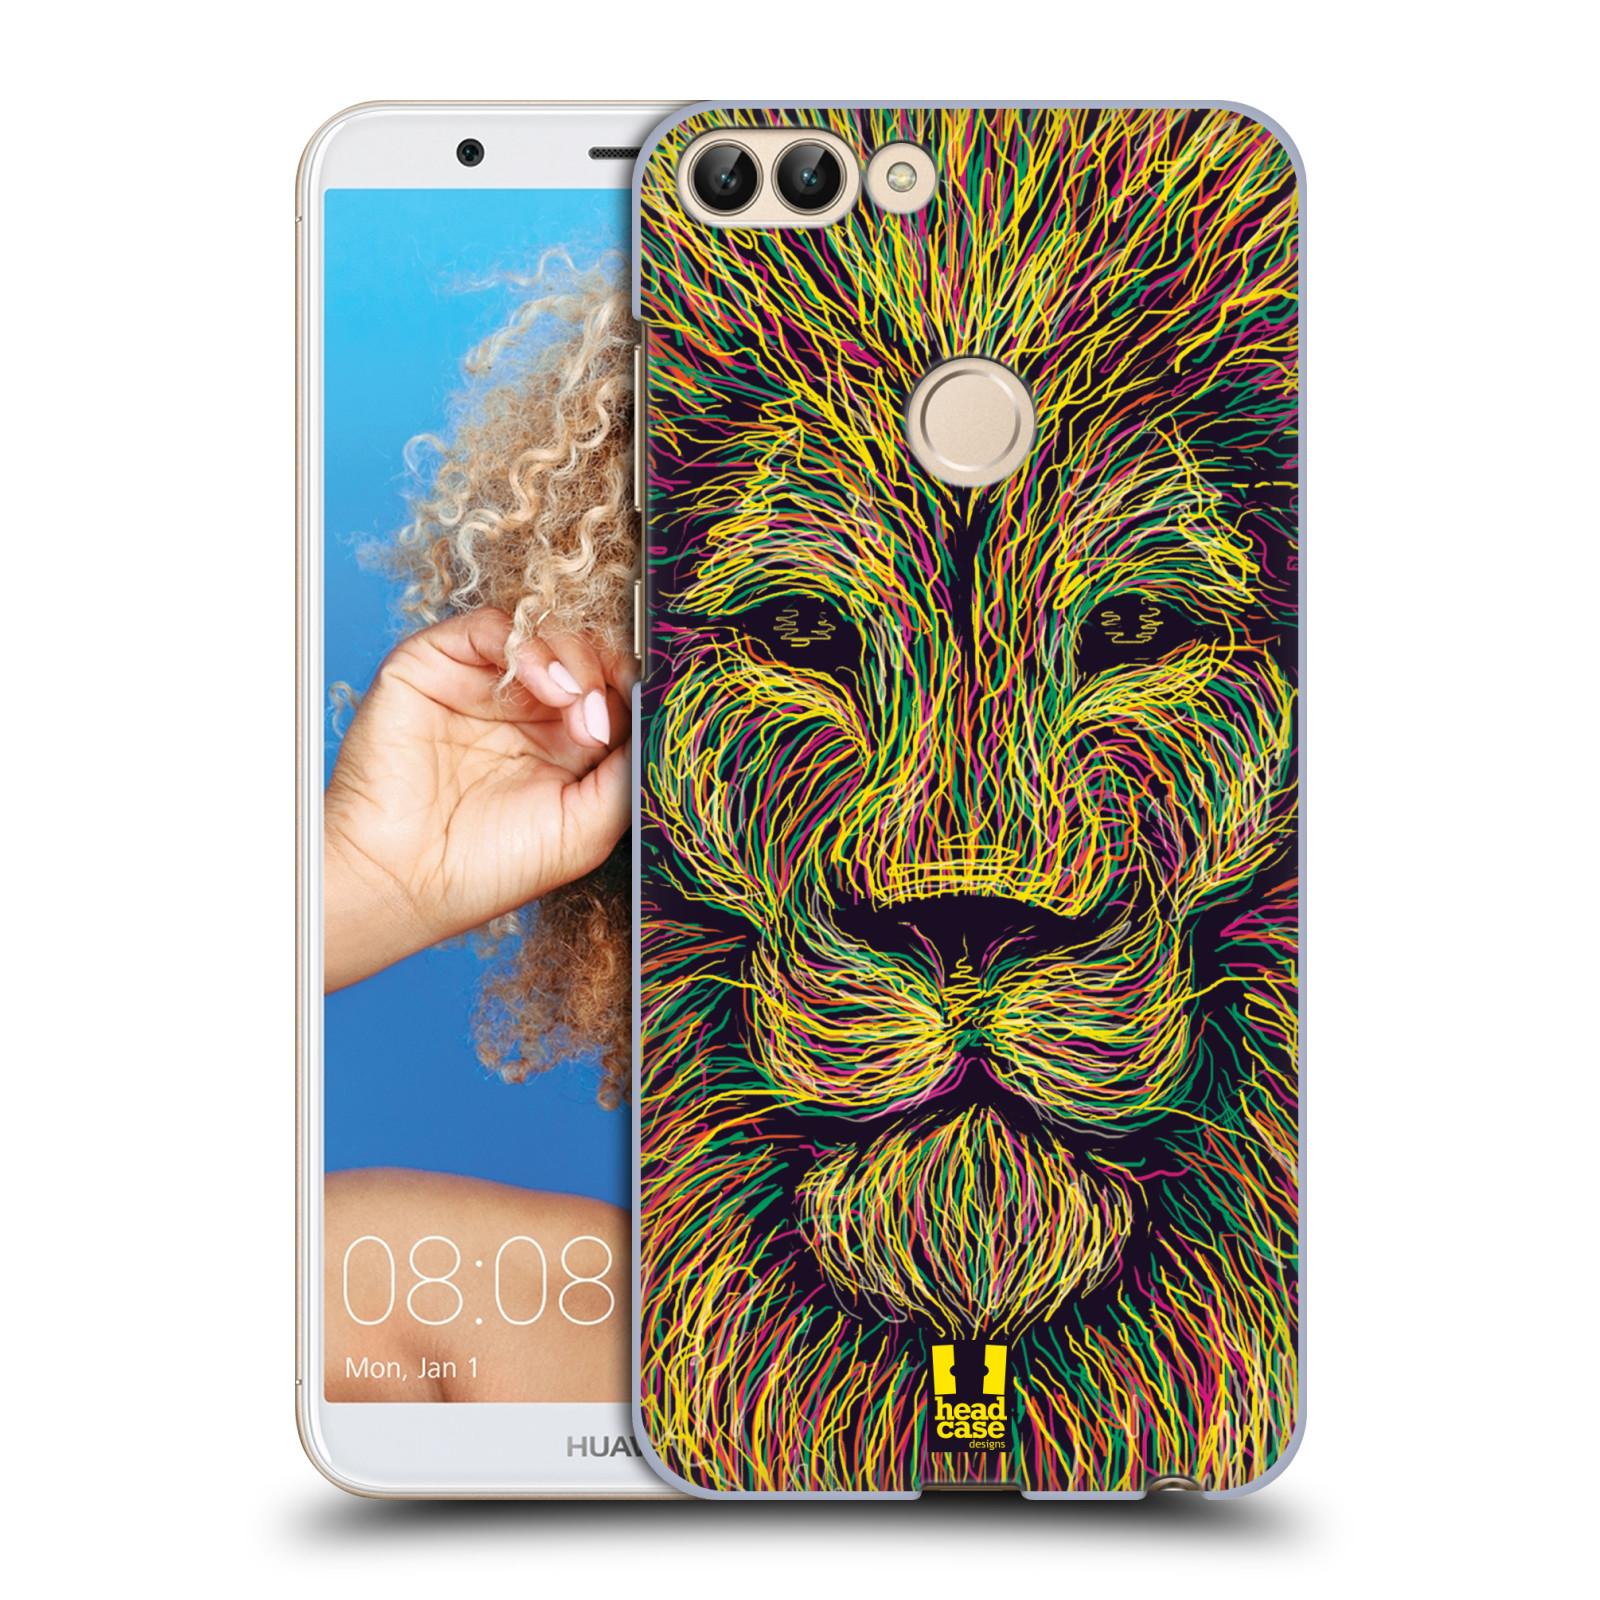 HEAD CASE plastový obal na mobil Huawei P Smart vzor zvíře čmáranice lev